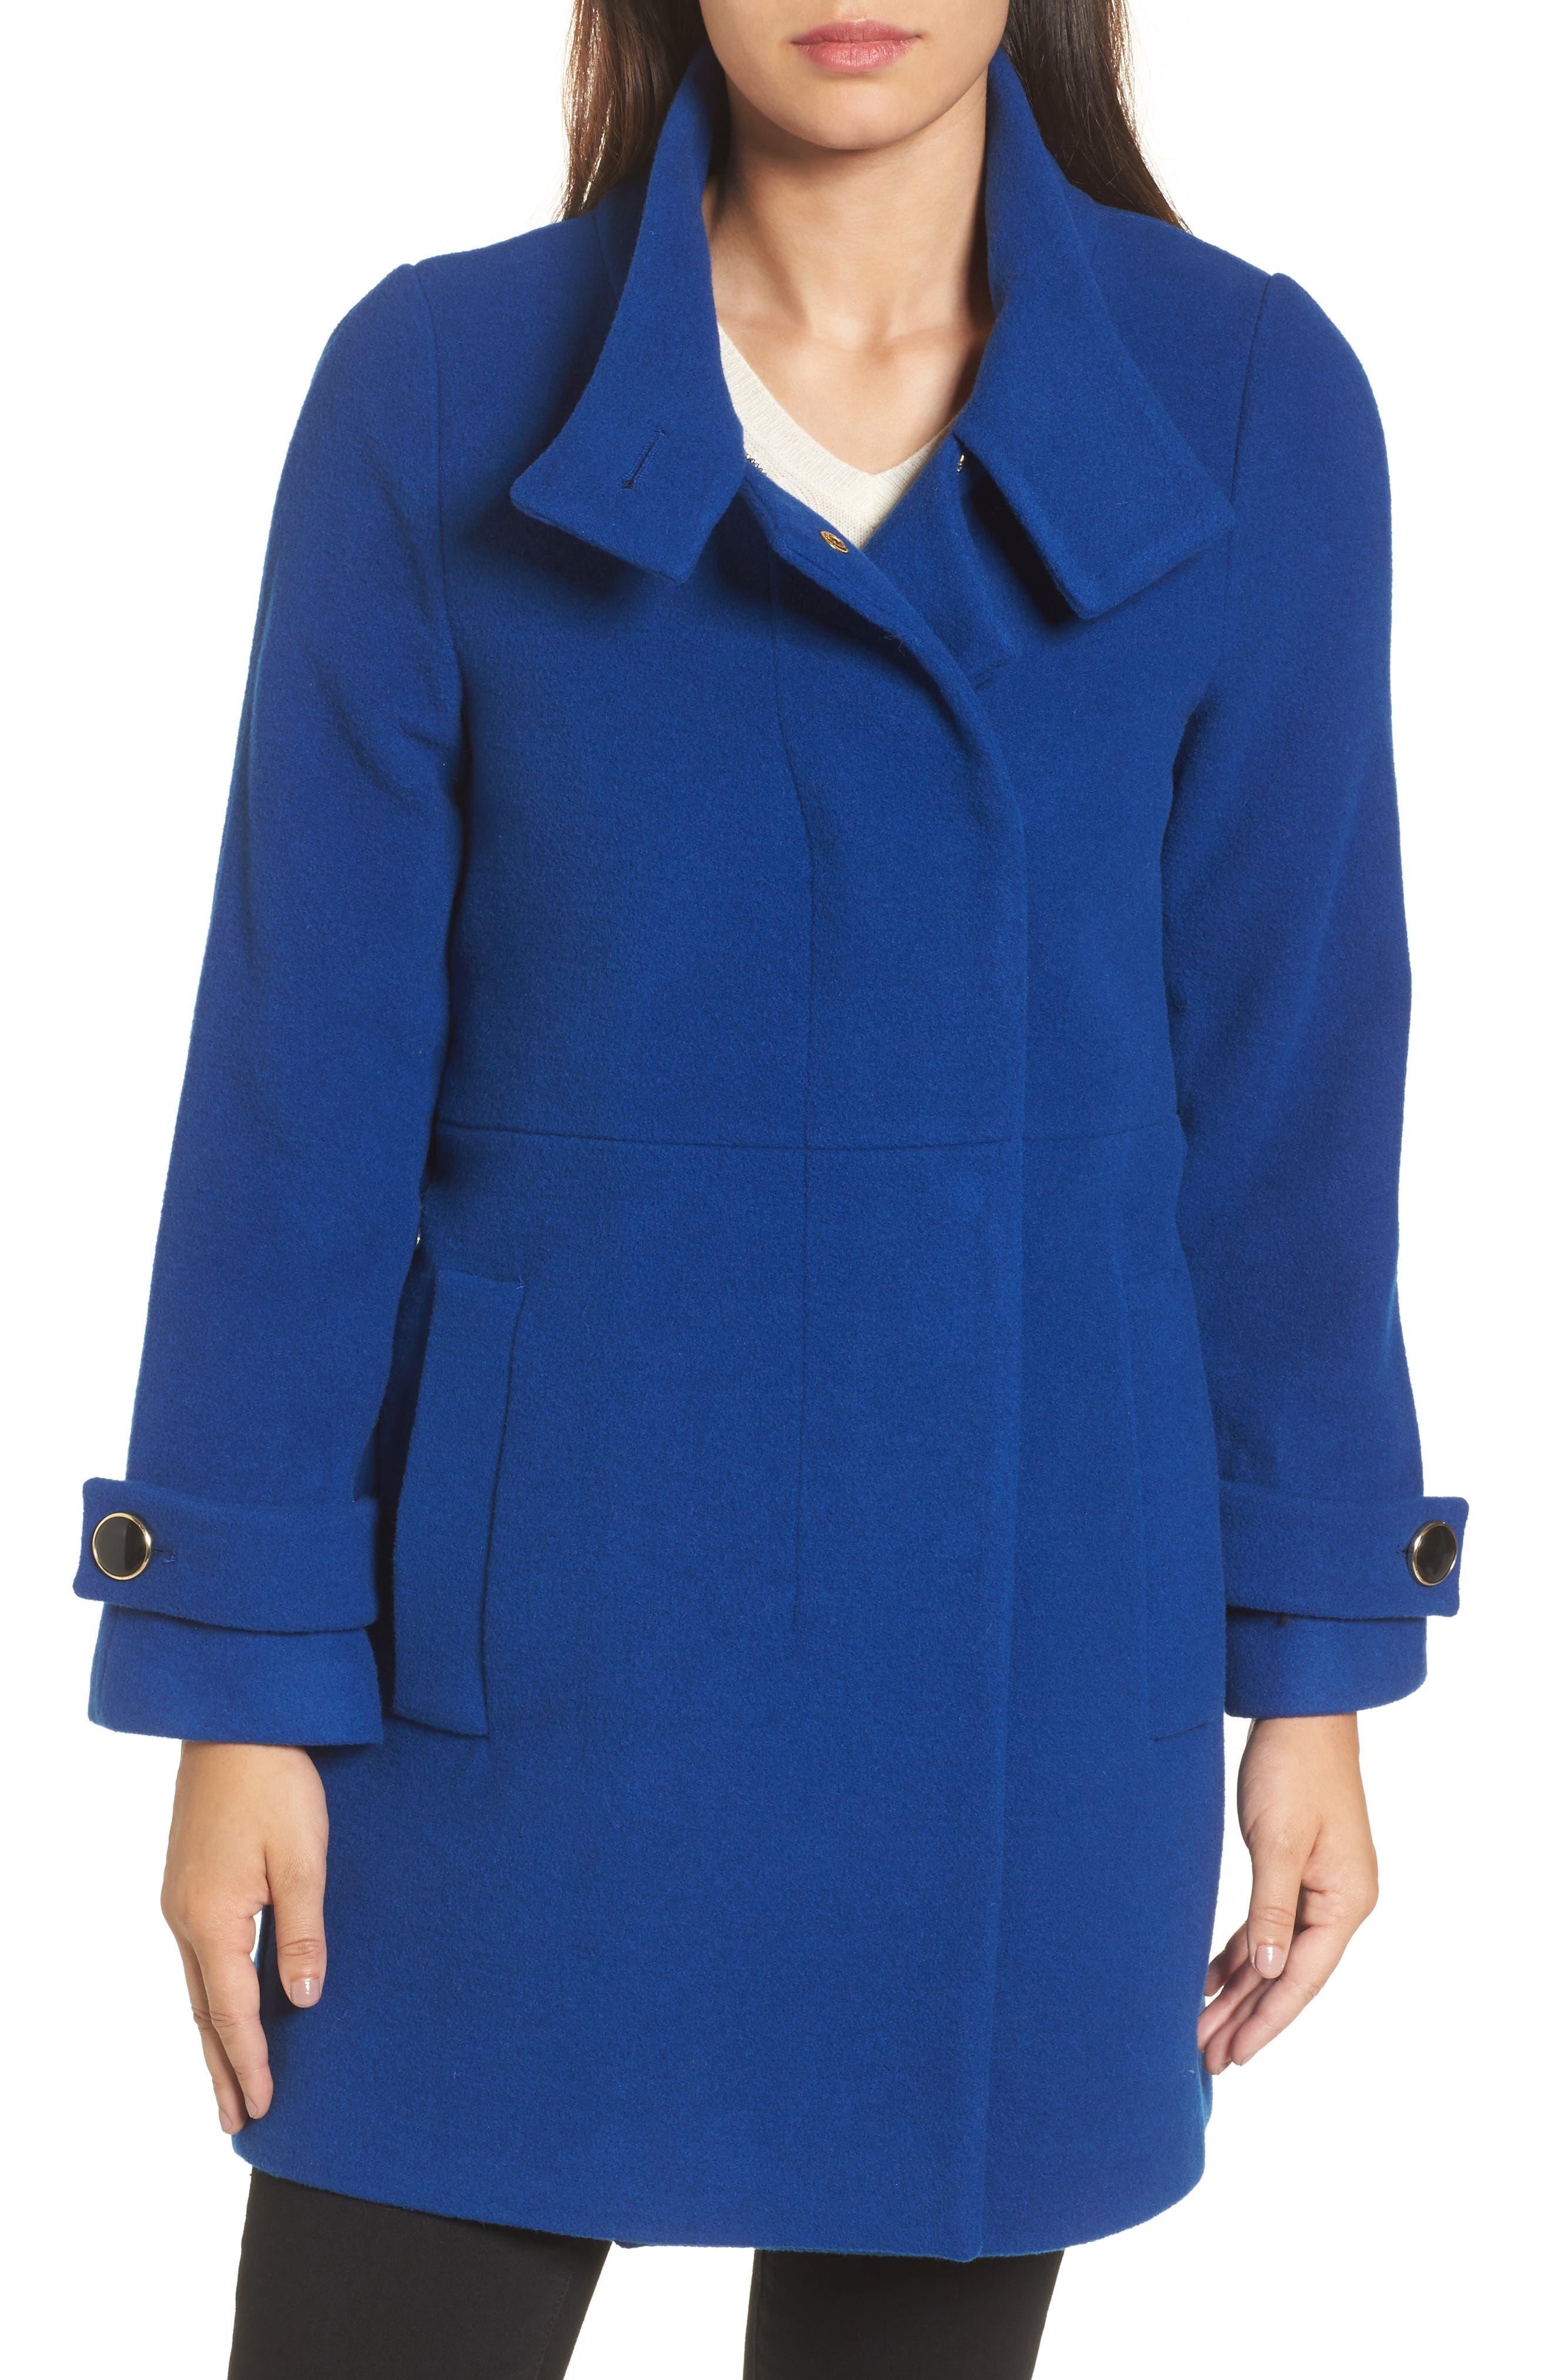 Trina Turk Wool Blend Coat